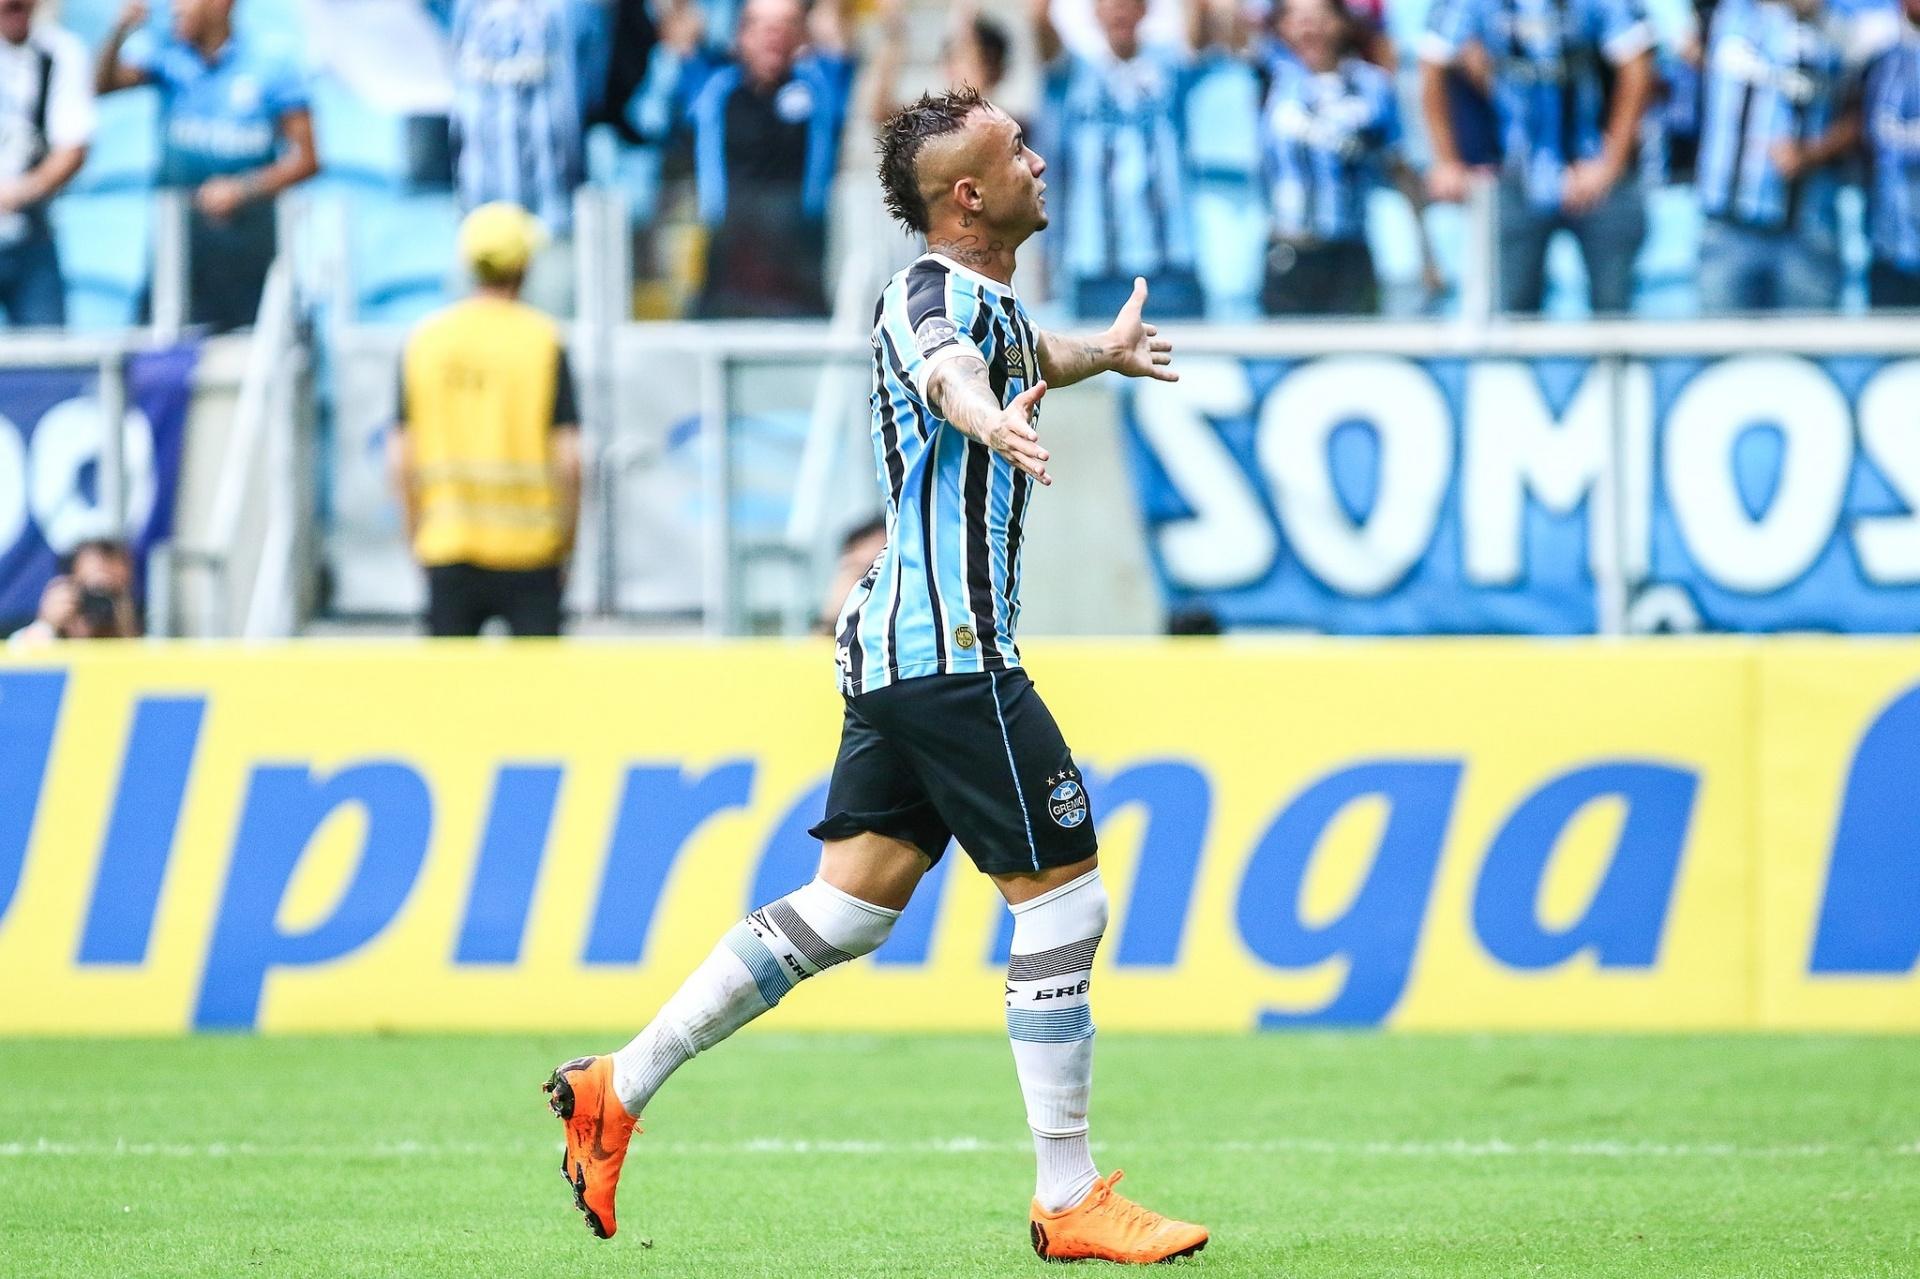 Everton repete passos de P. Rocha e se valoriza ainda mais no Grêmio -  03 04 2018 - UOL Esporte ecdfdb5b8bbdb